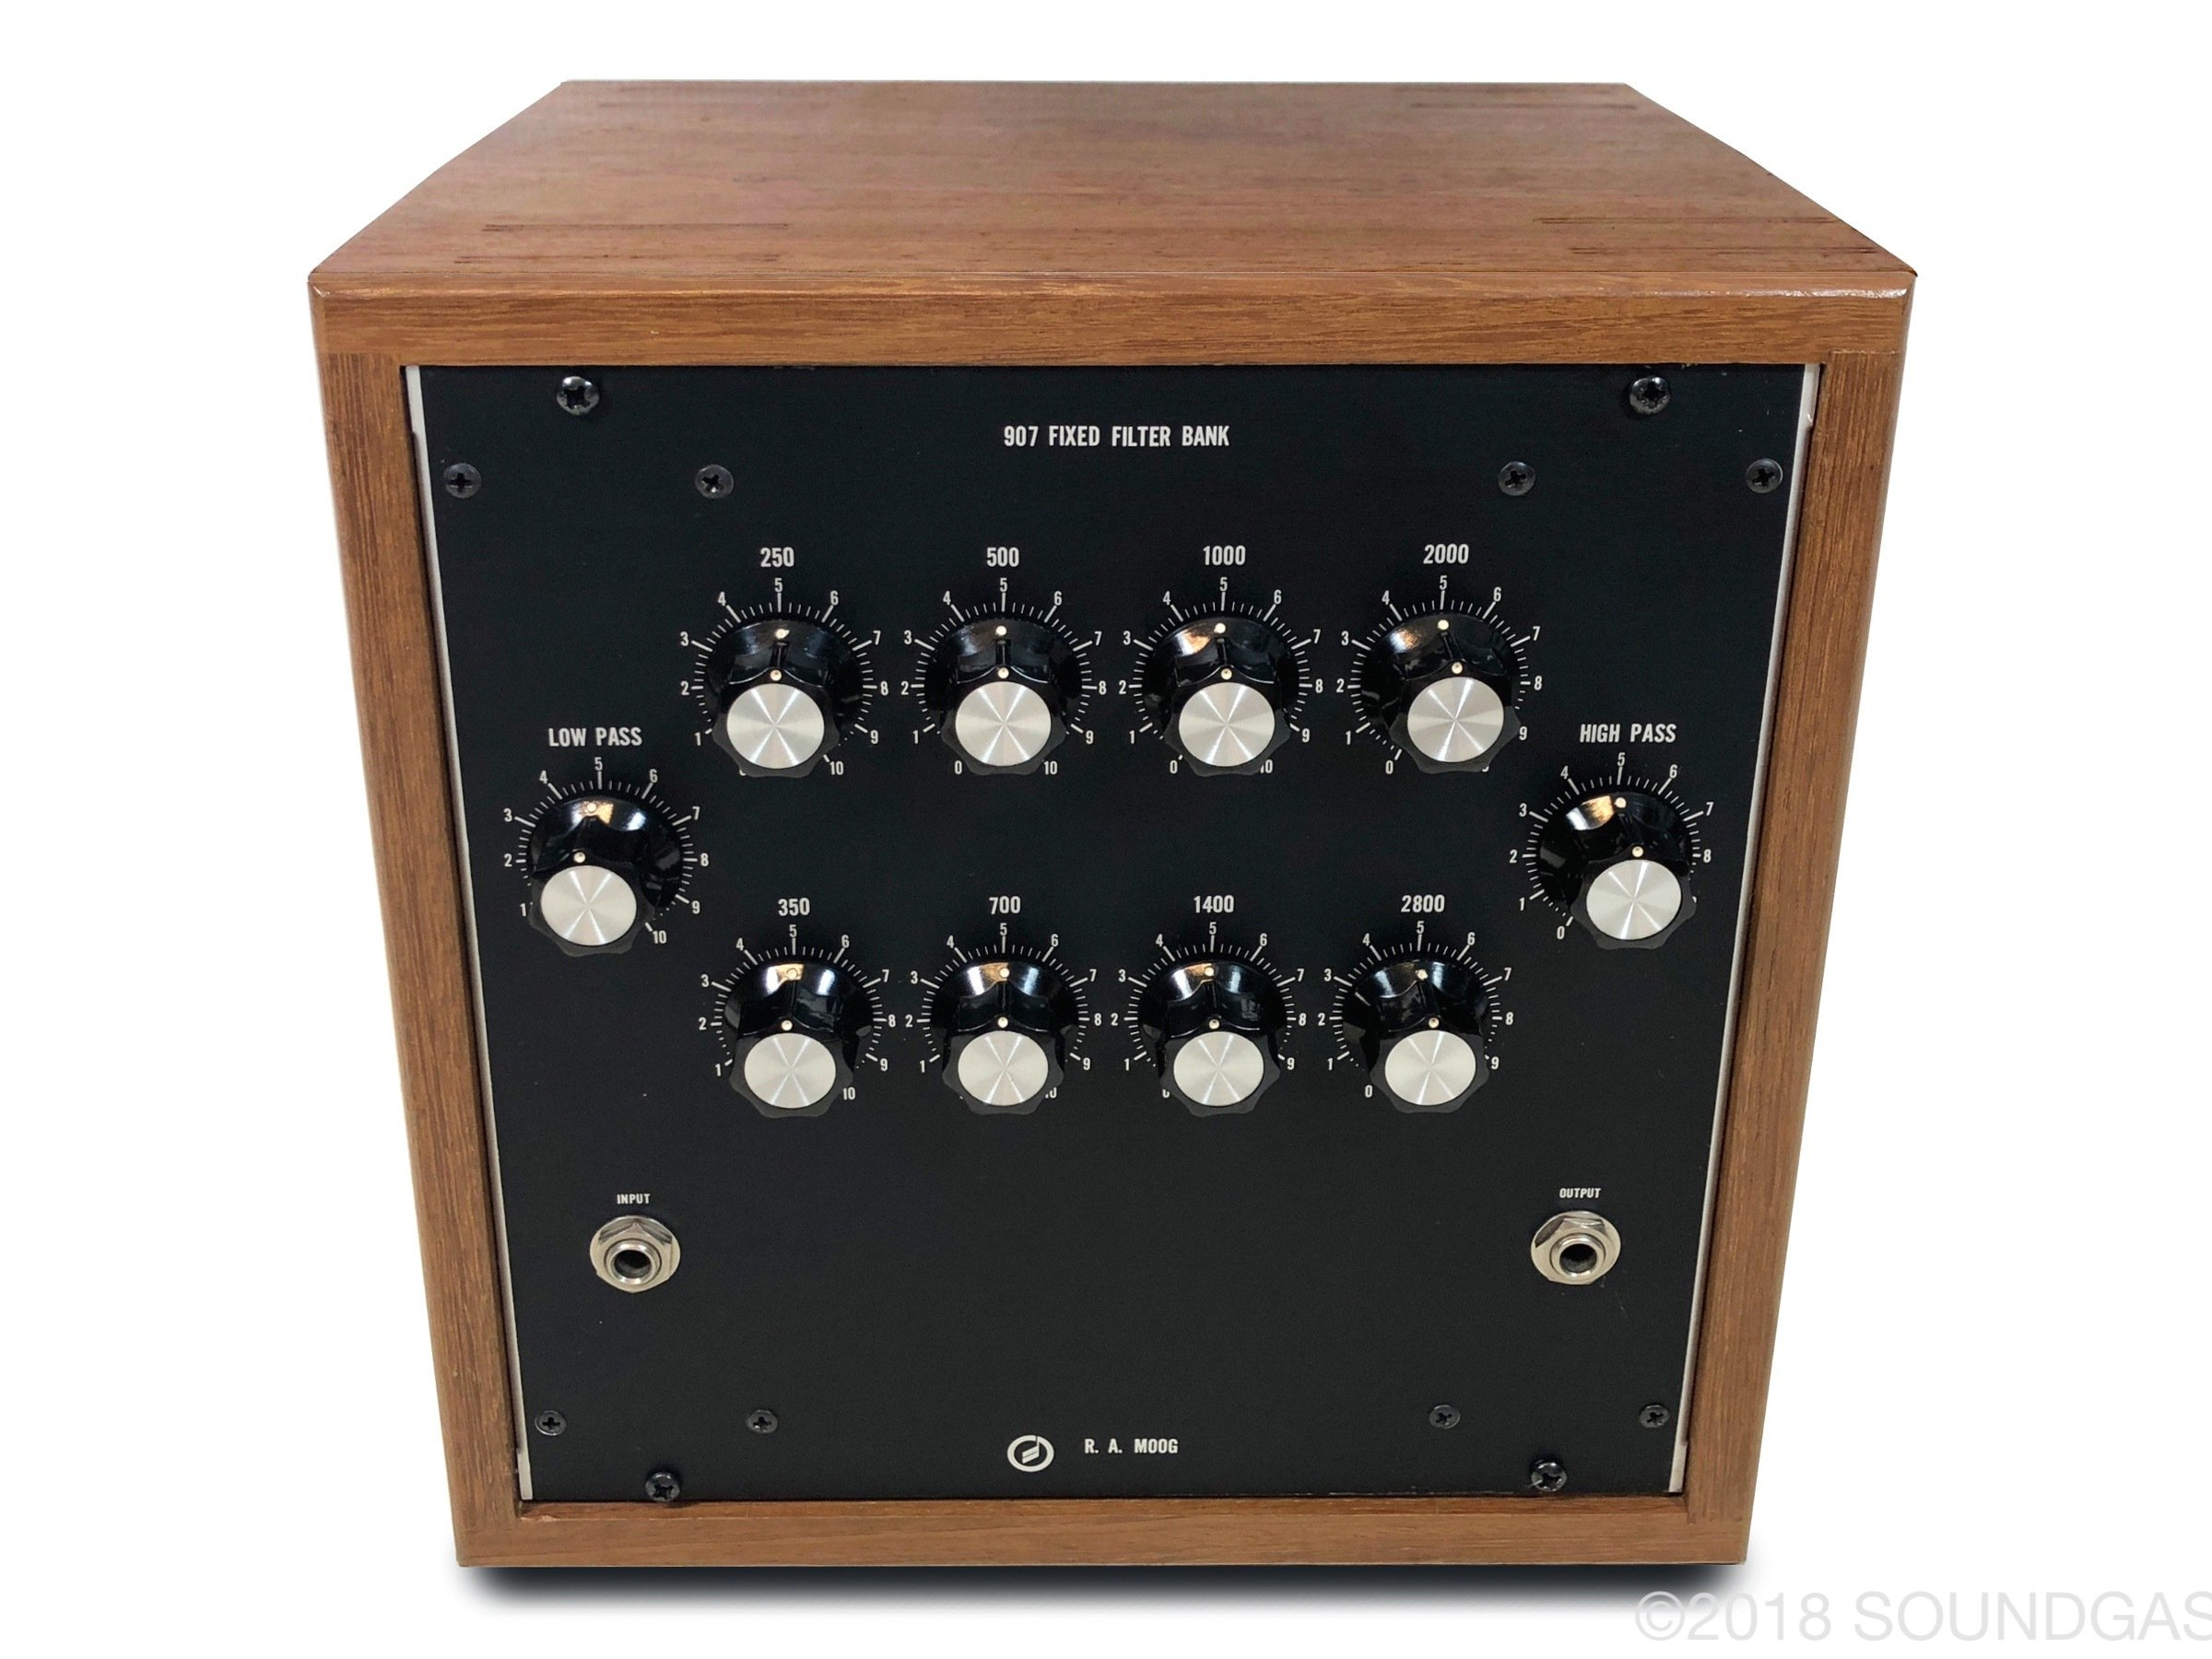 R.A. Moog 907 Fixed Filter Bank